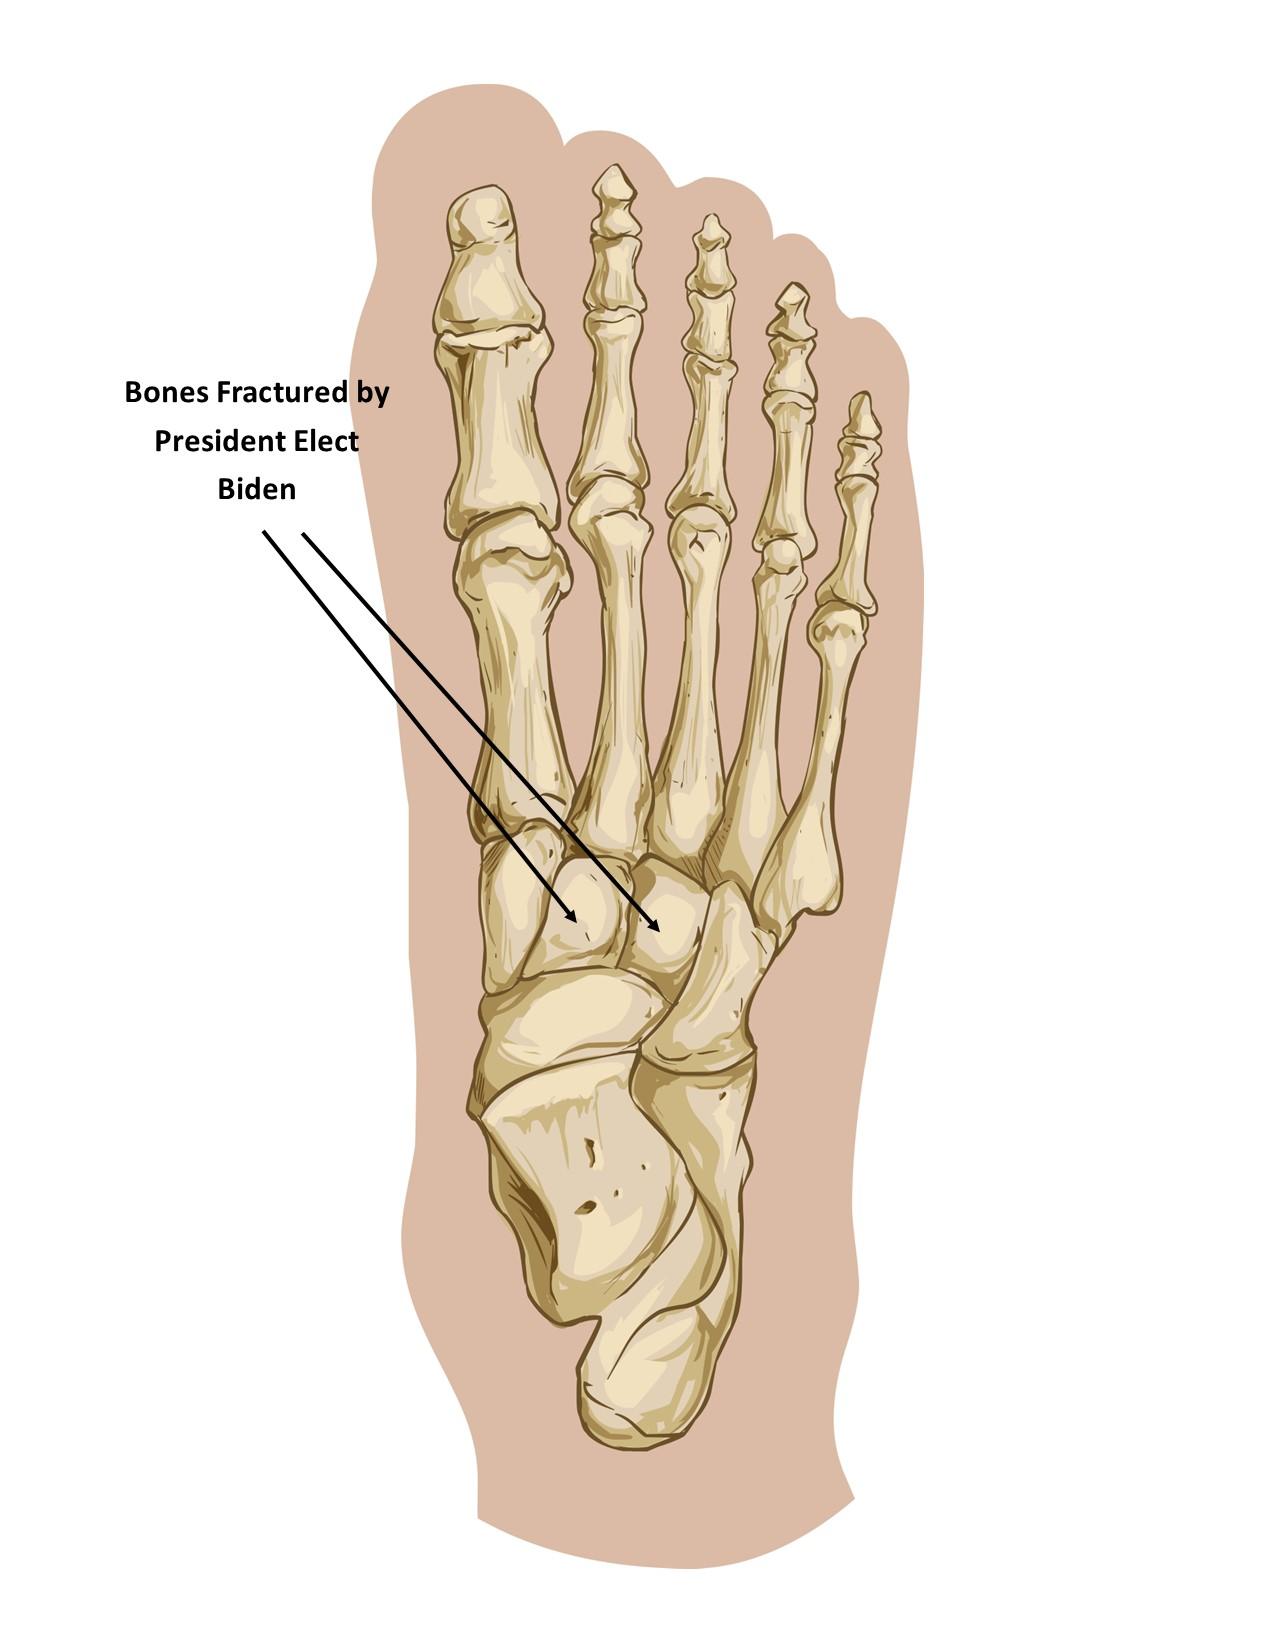 Houston podiatrist discusses President Elect Biden fracturing his foot